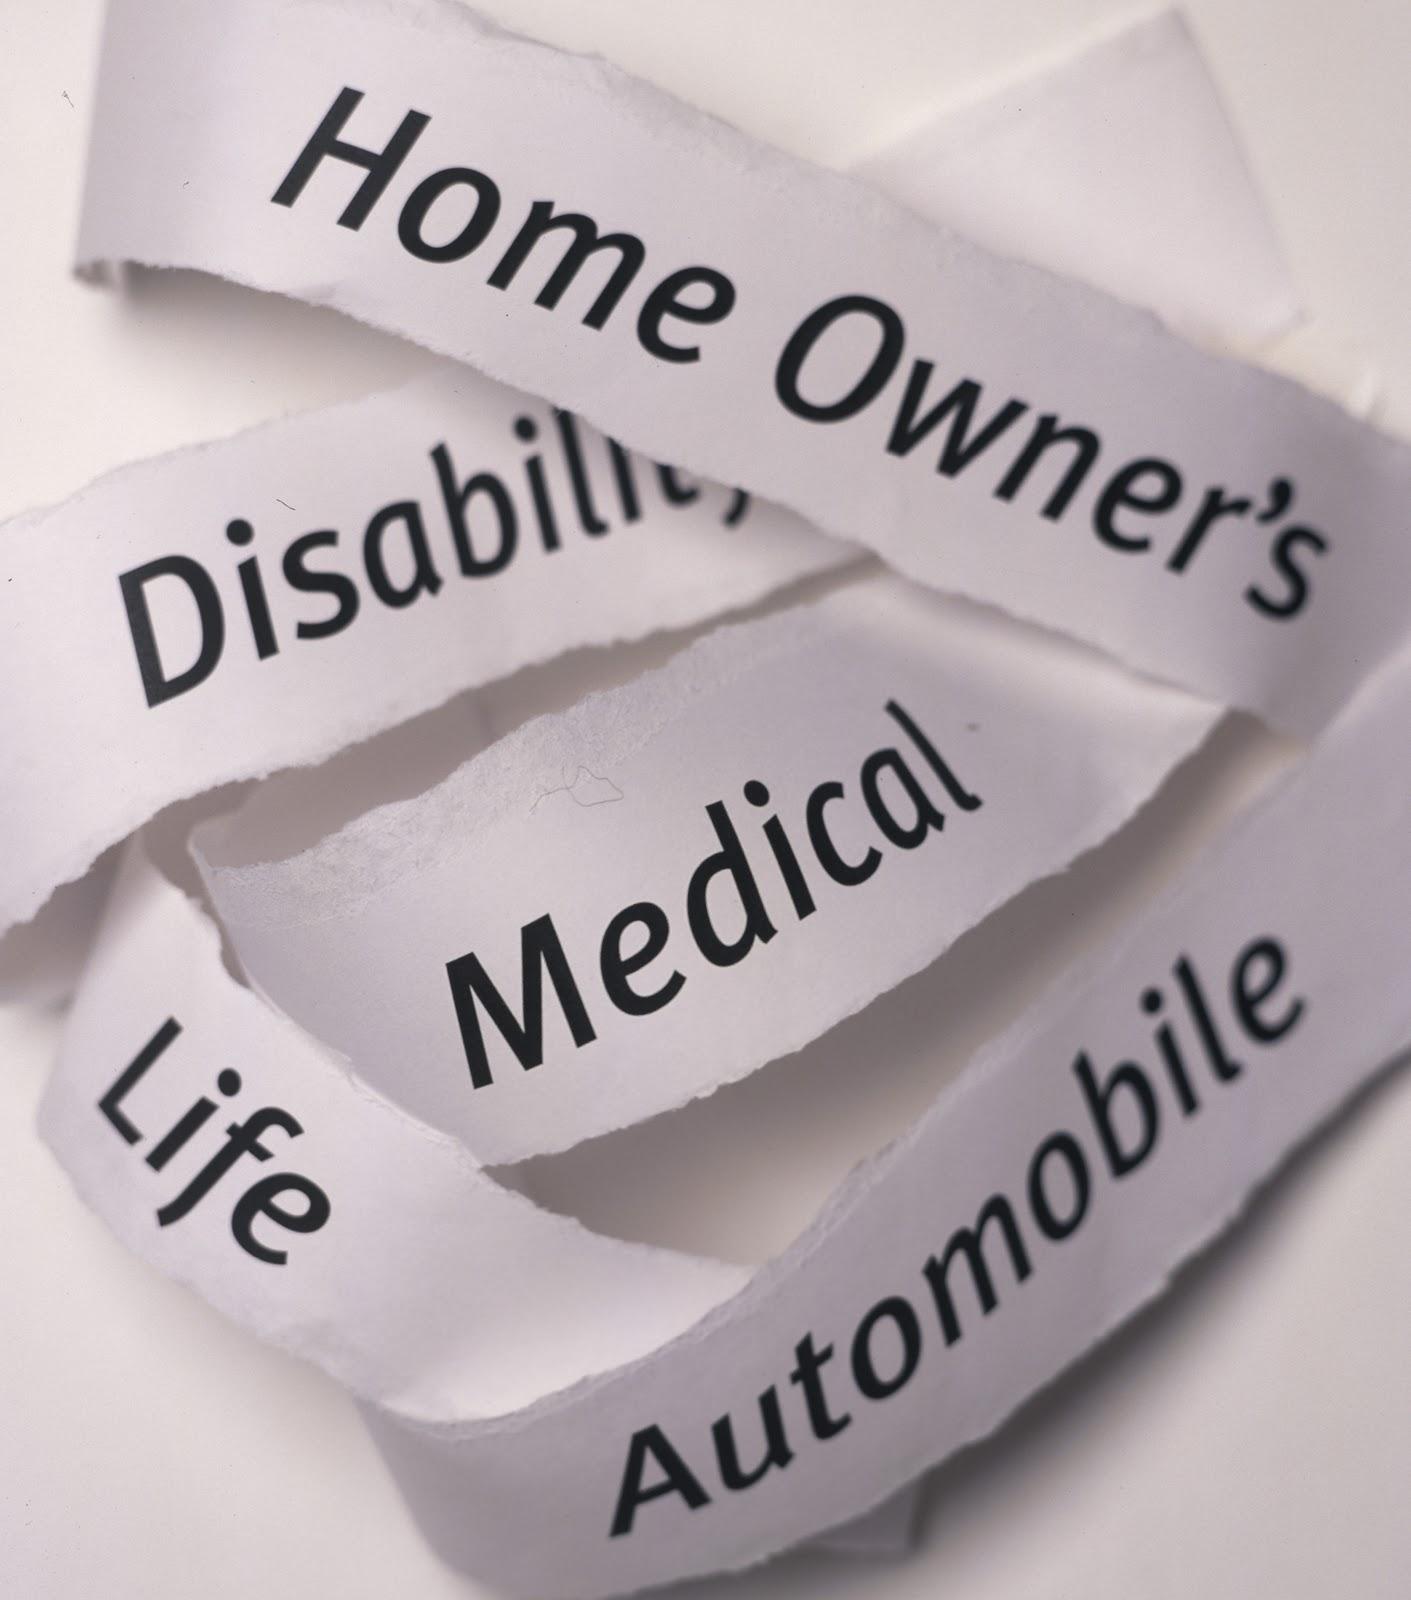 http://2.bp.blogspot.com/_r187mq3J5-M/TSjqxWFZmZI/AAAAAAAAA2E/96PuDL6wZ6U/s1600/Medical-Insurance.jpg